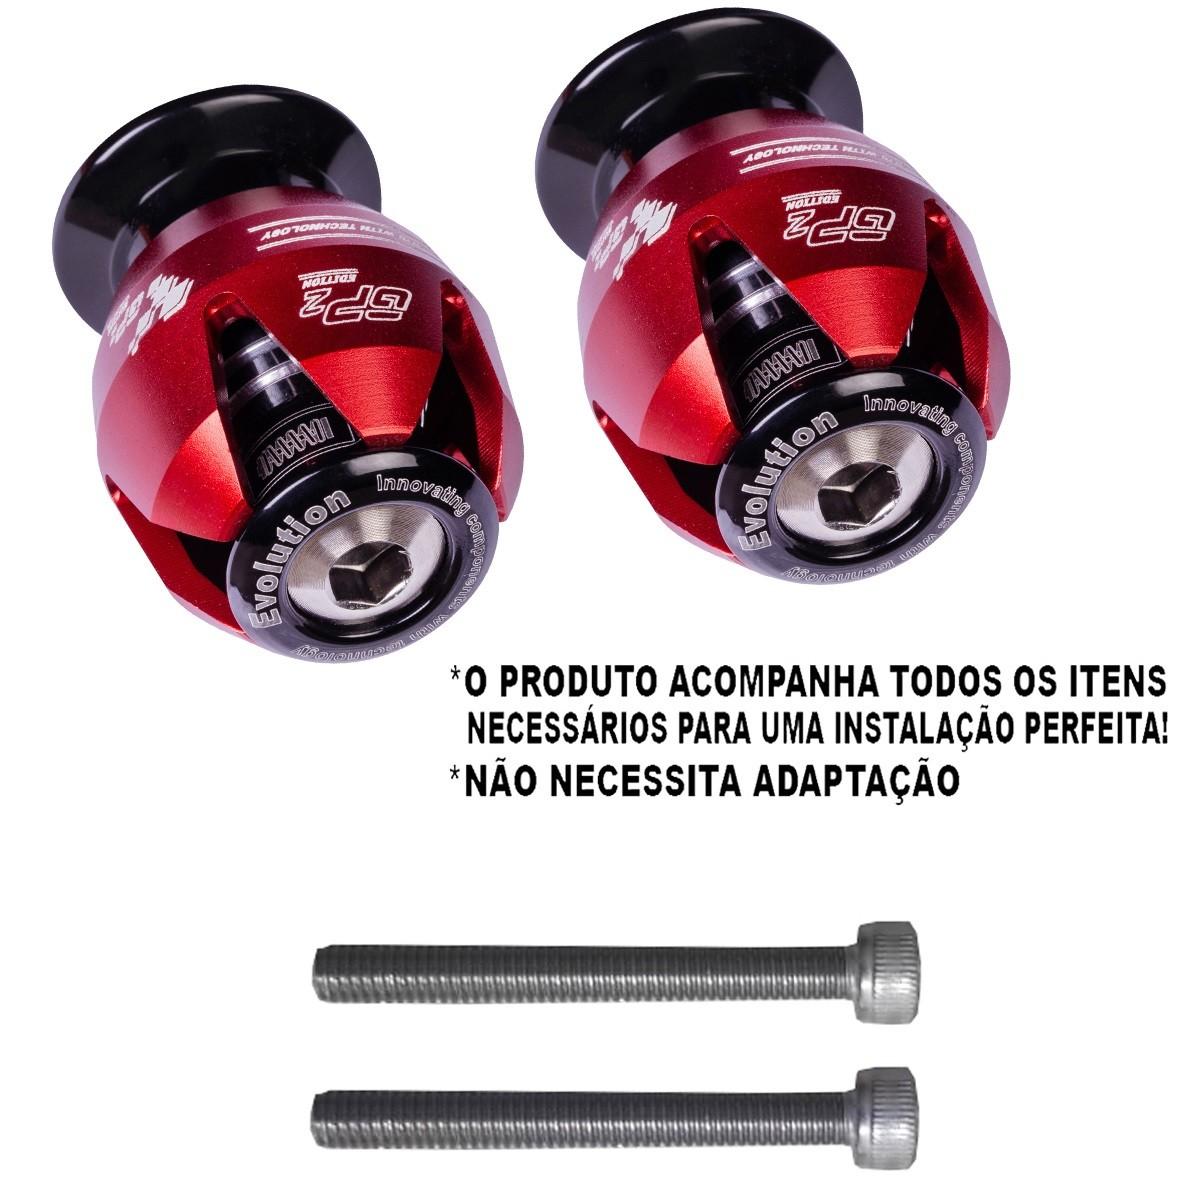 Slider traseiro R1 2004 2005 2006 2007 2008 2008 2009 2010 2011 2012 2013 2014 balança yamaha gp2 edition